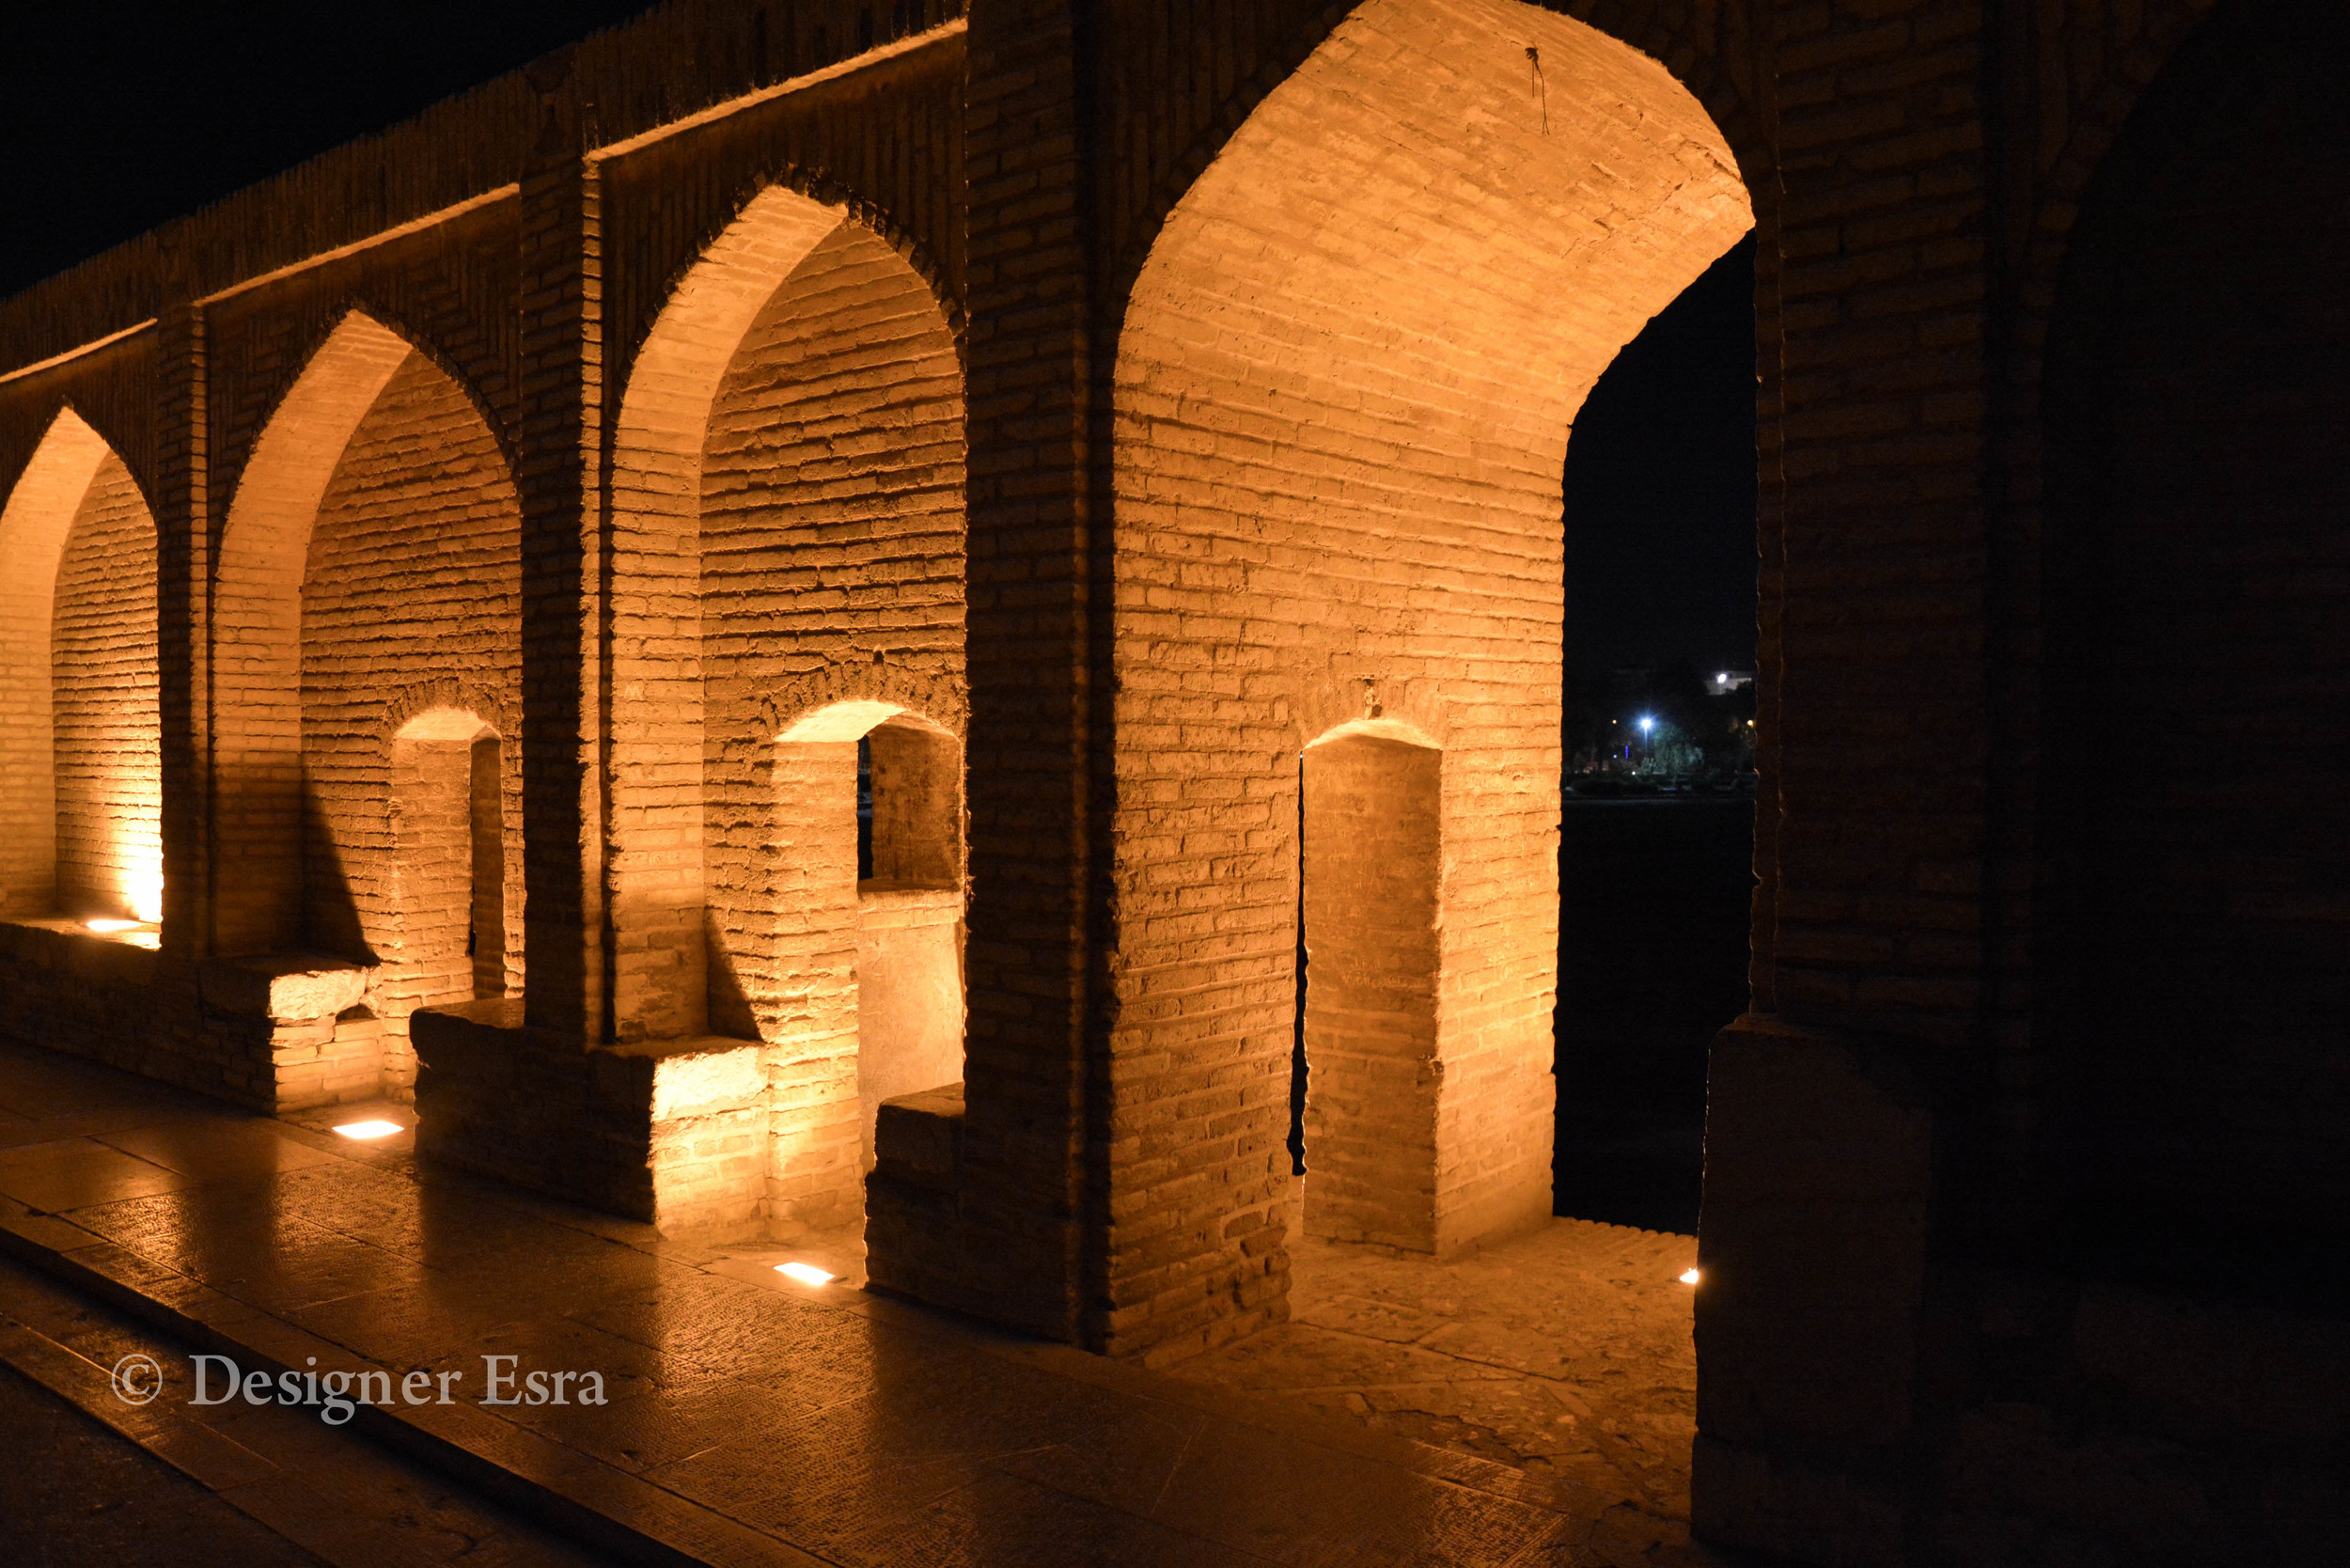 Arches in the Esfahani Bridge